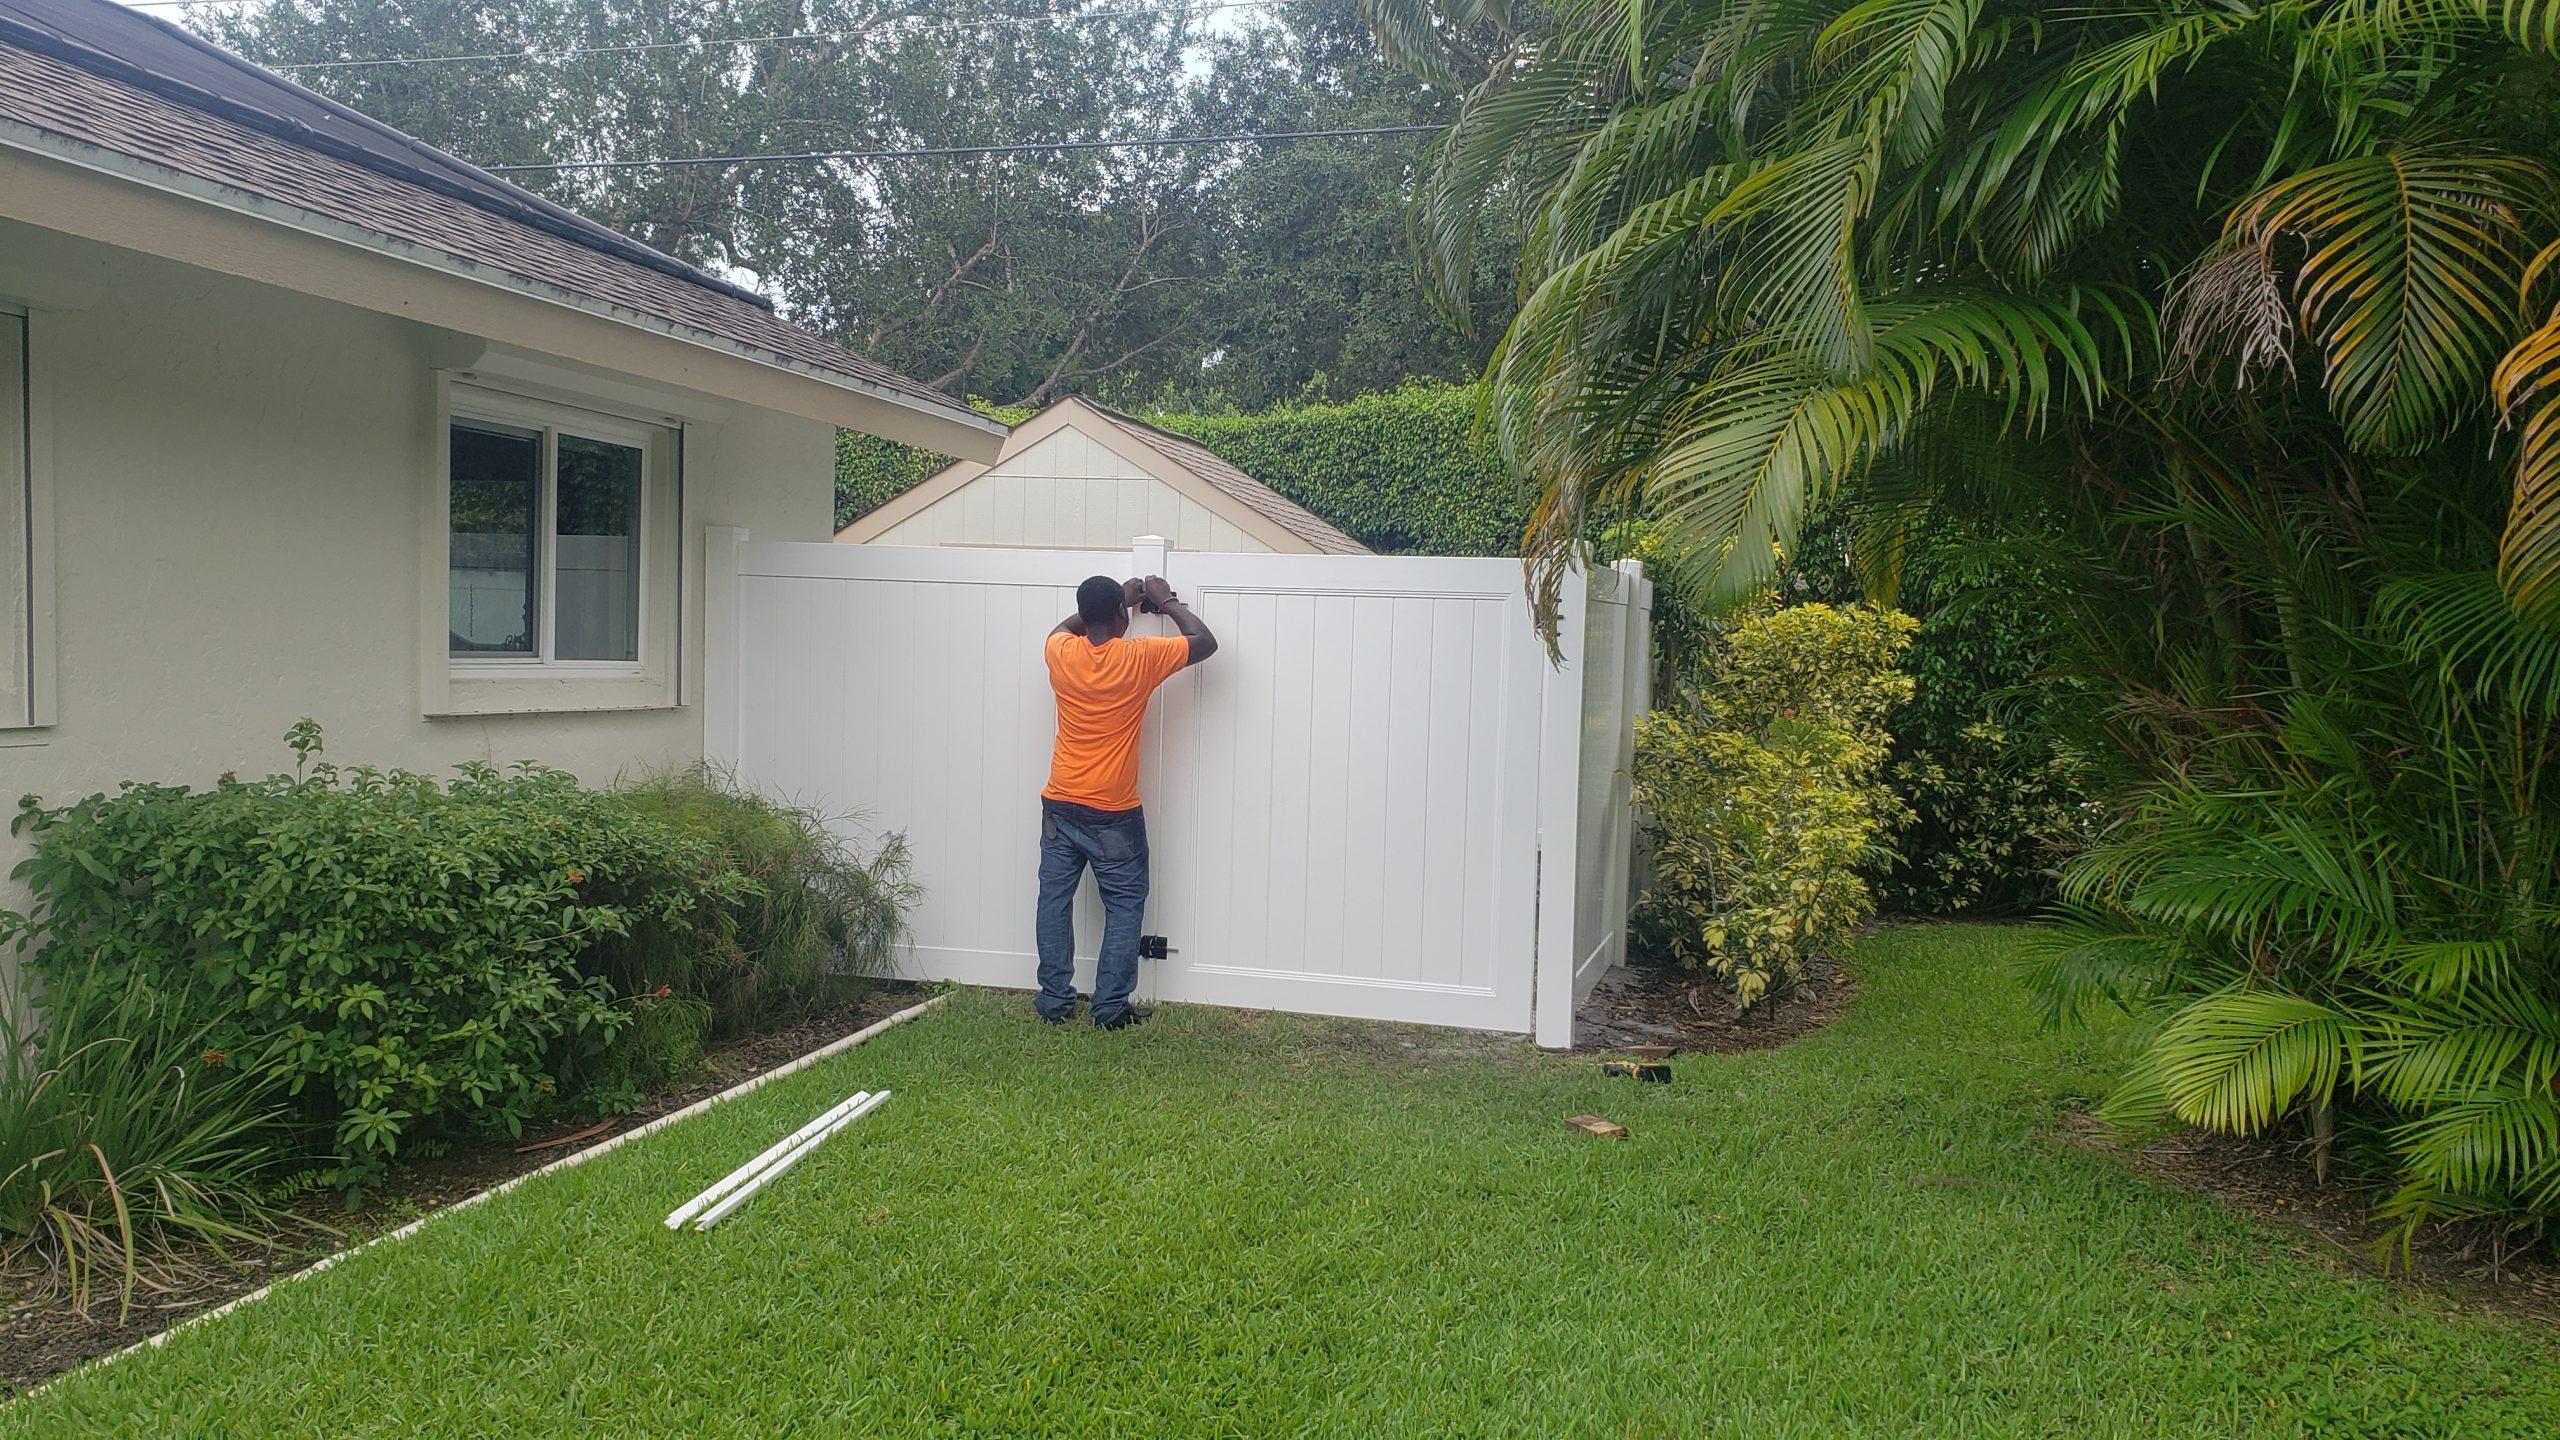 Best Fence Contractors in Primm, NV